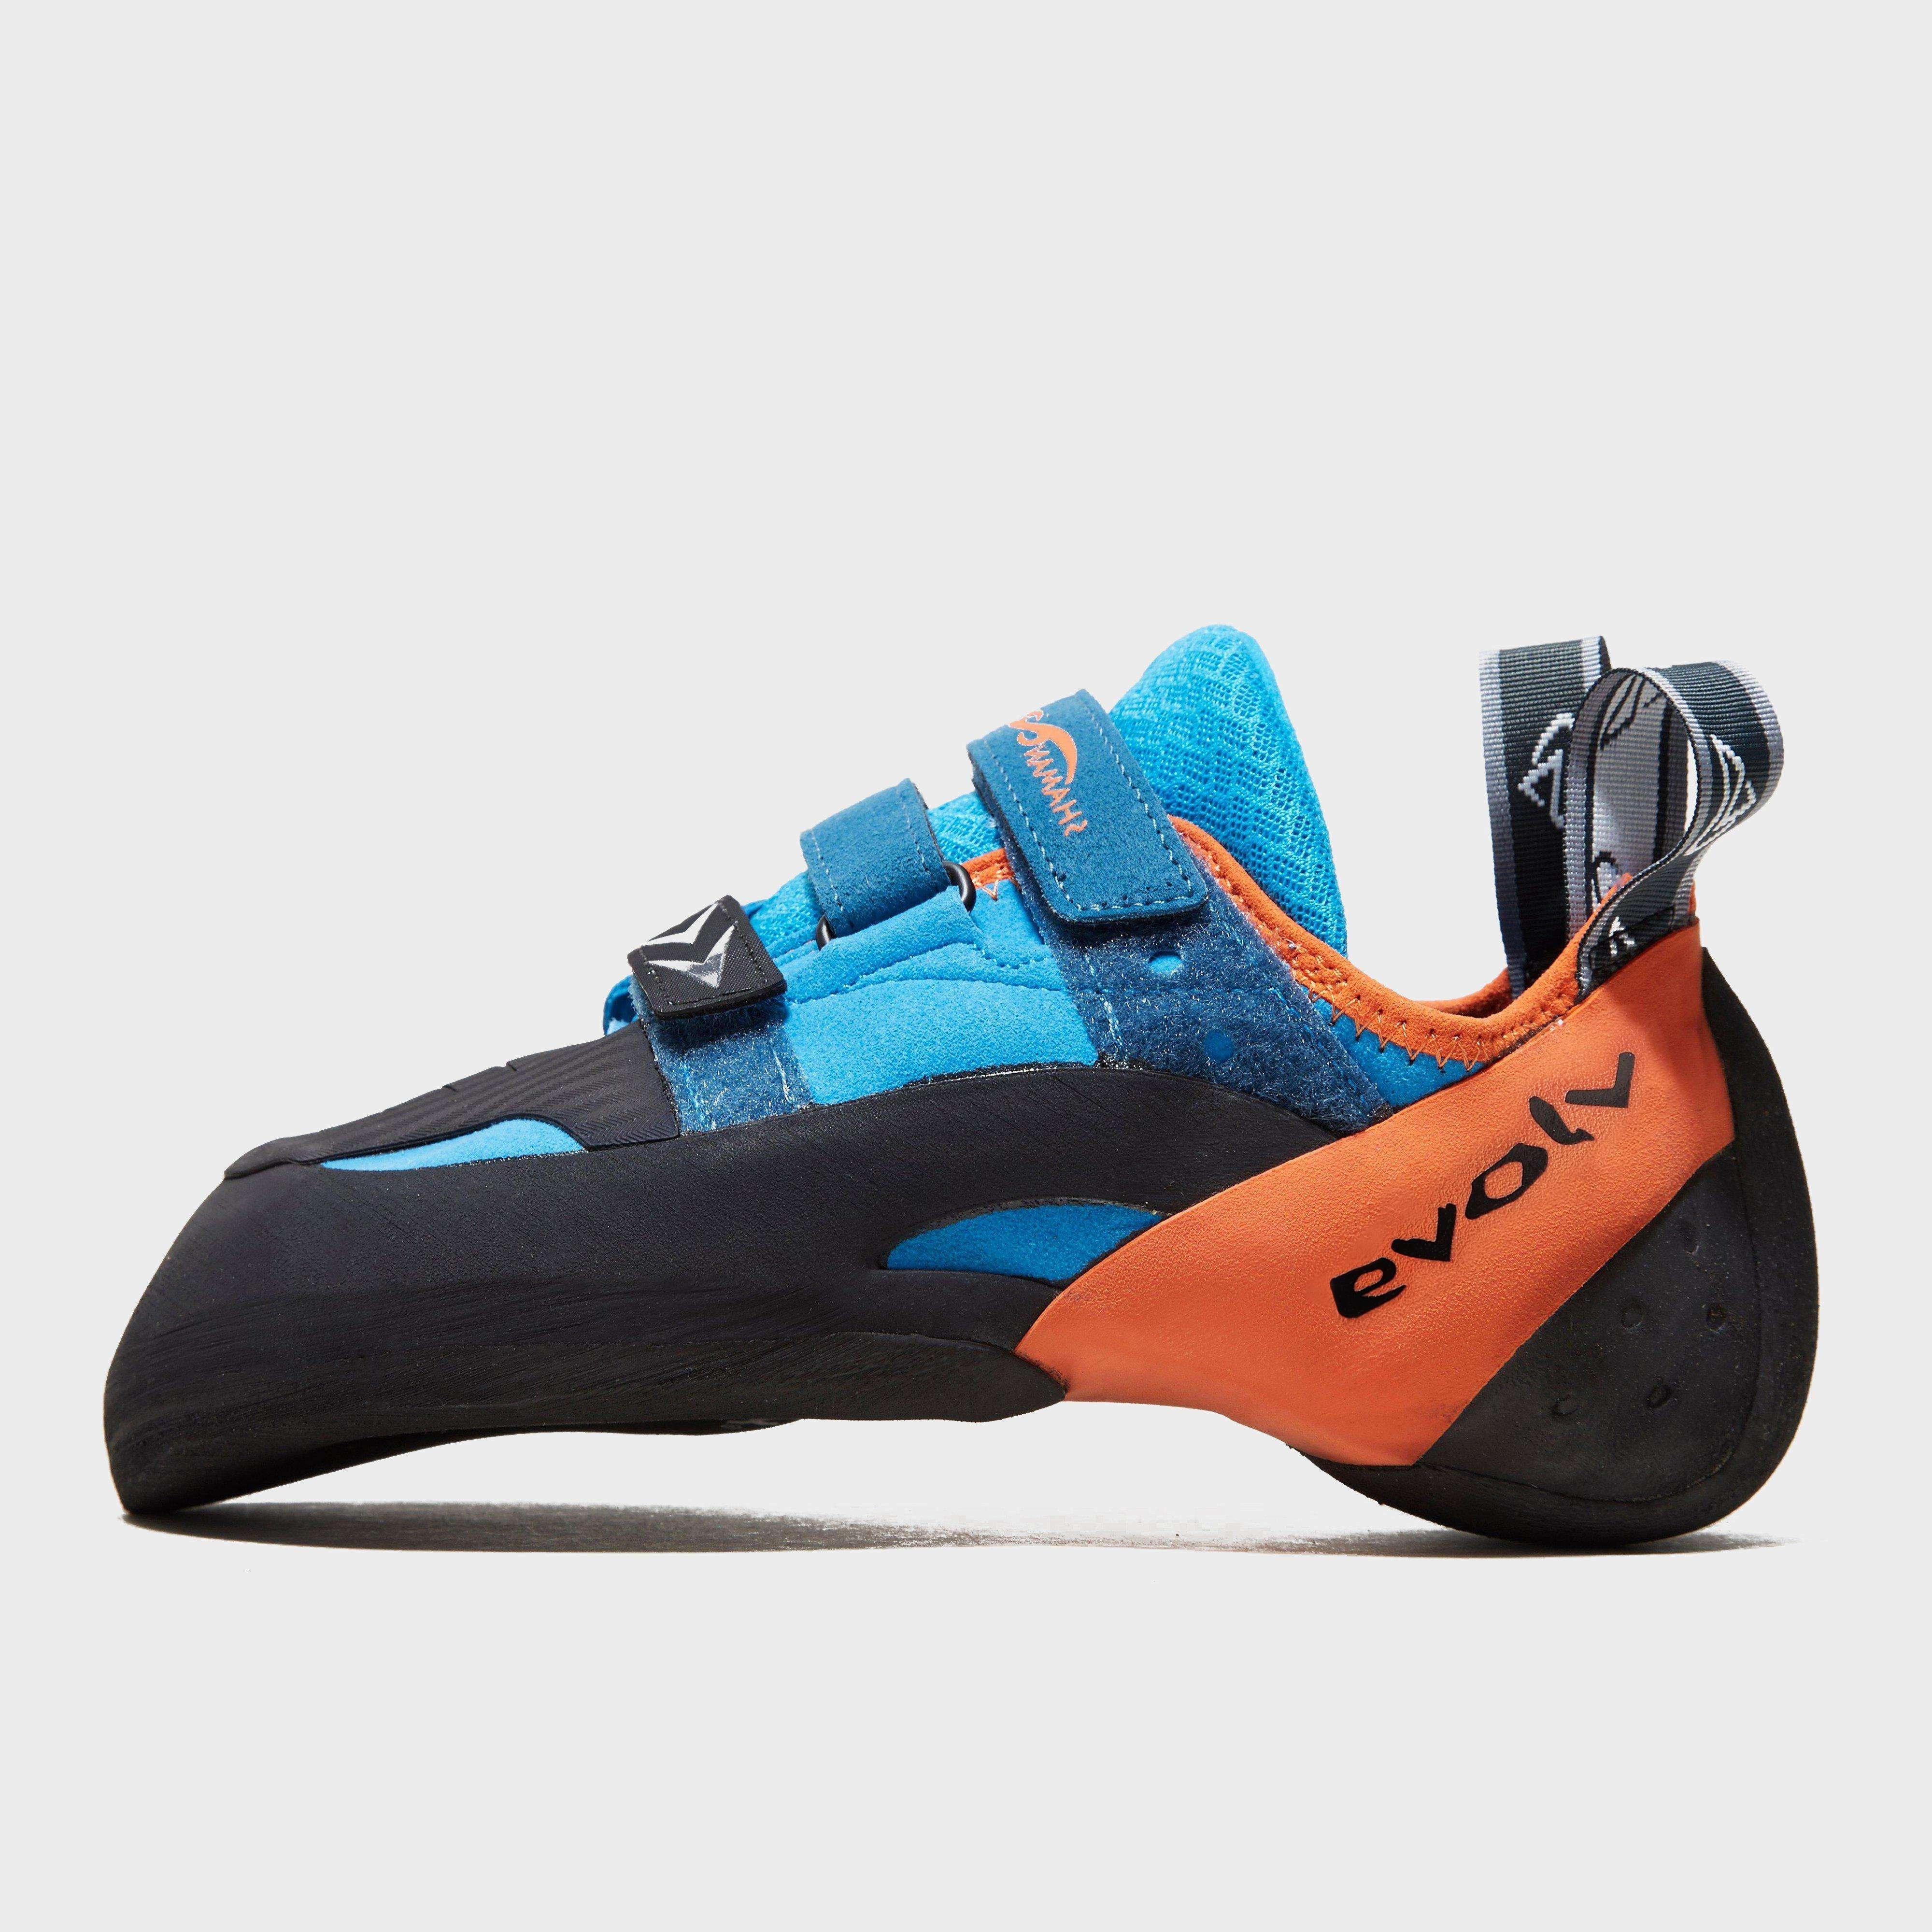 EVOLV Men's Shaman Climbing Shoes